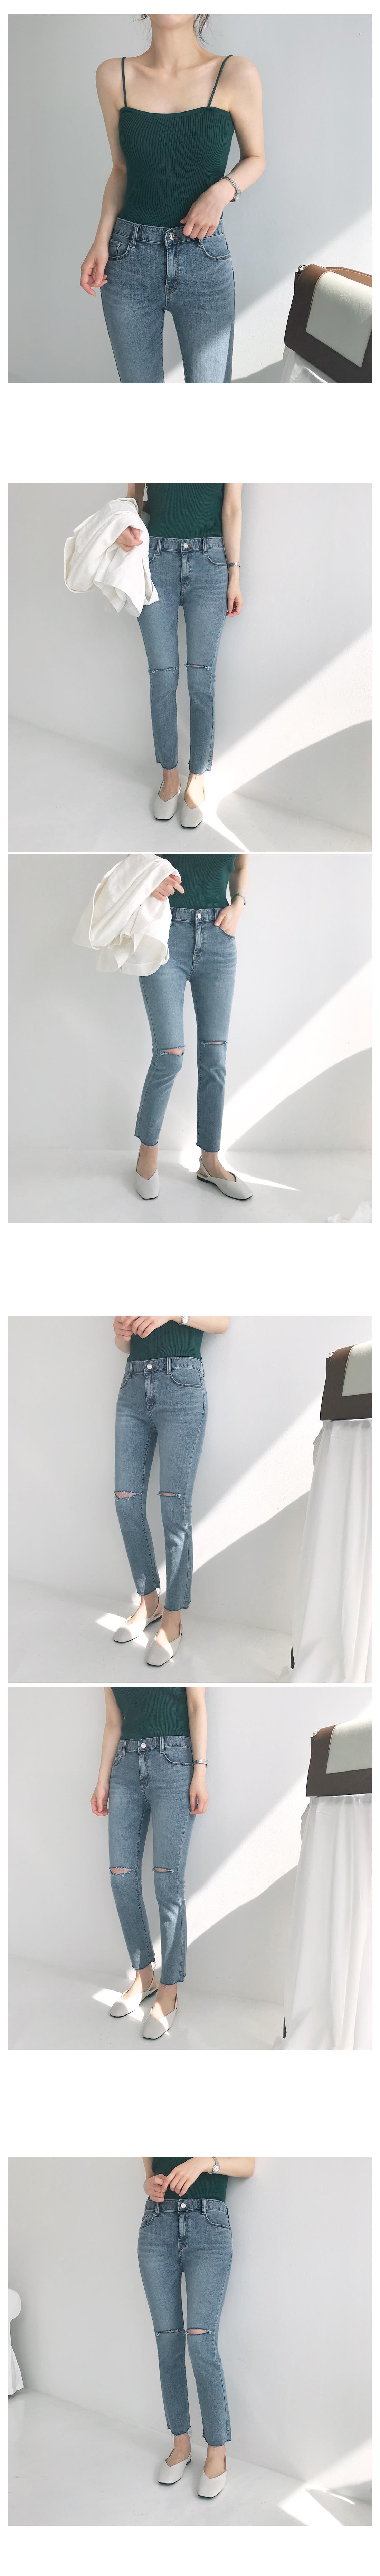 Jackson cut slim pants